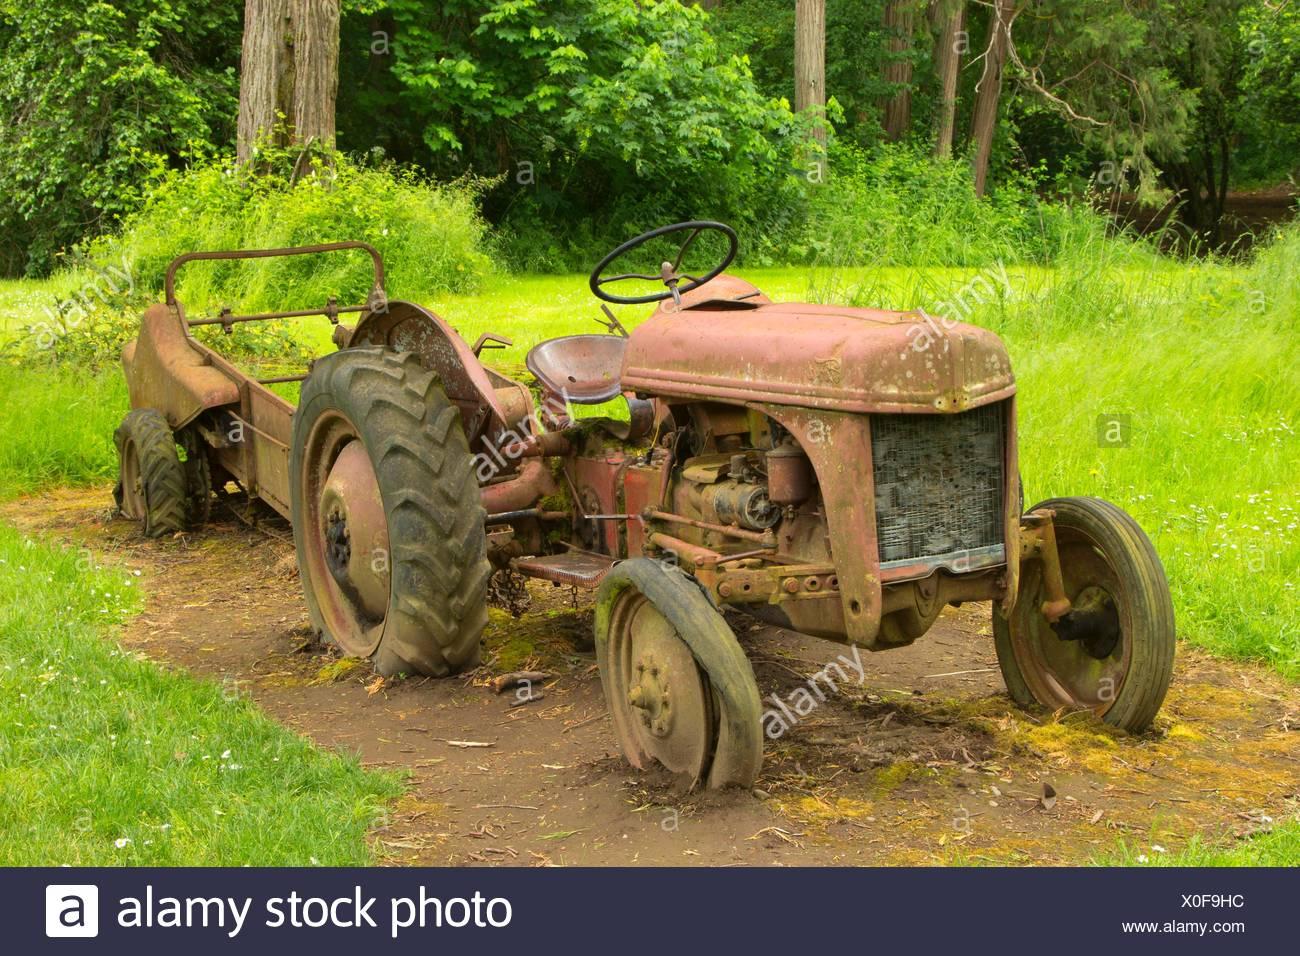 tractor dorris ranch living history filbert farm county park lane